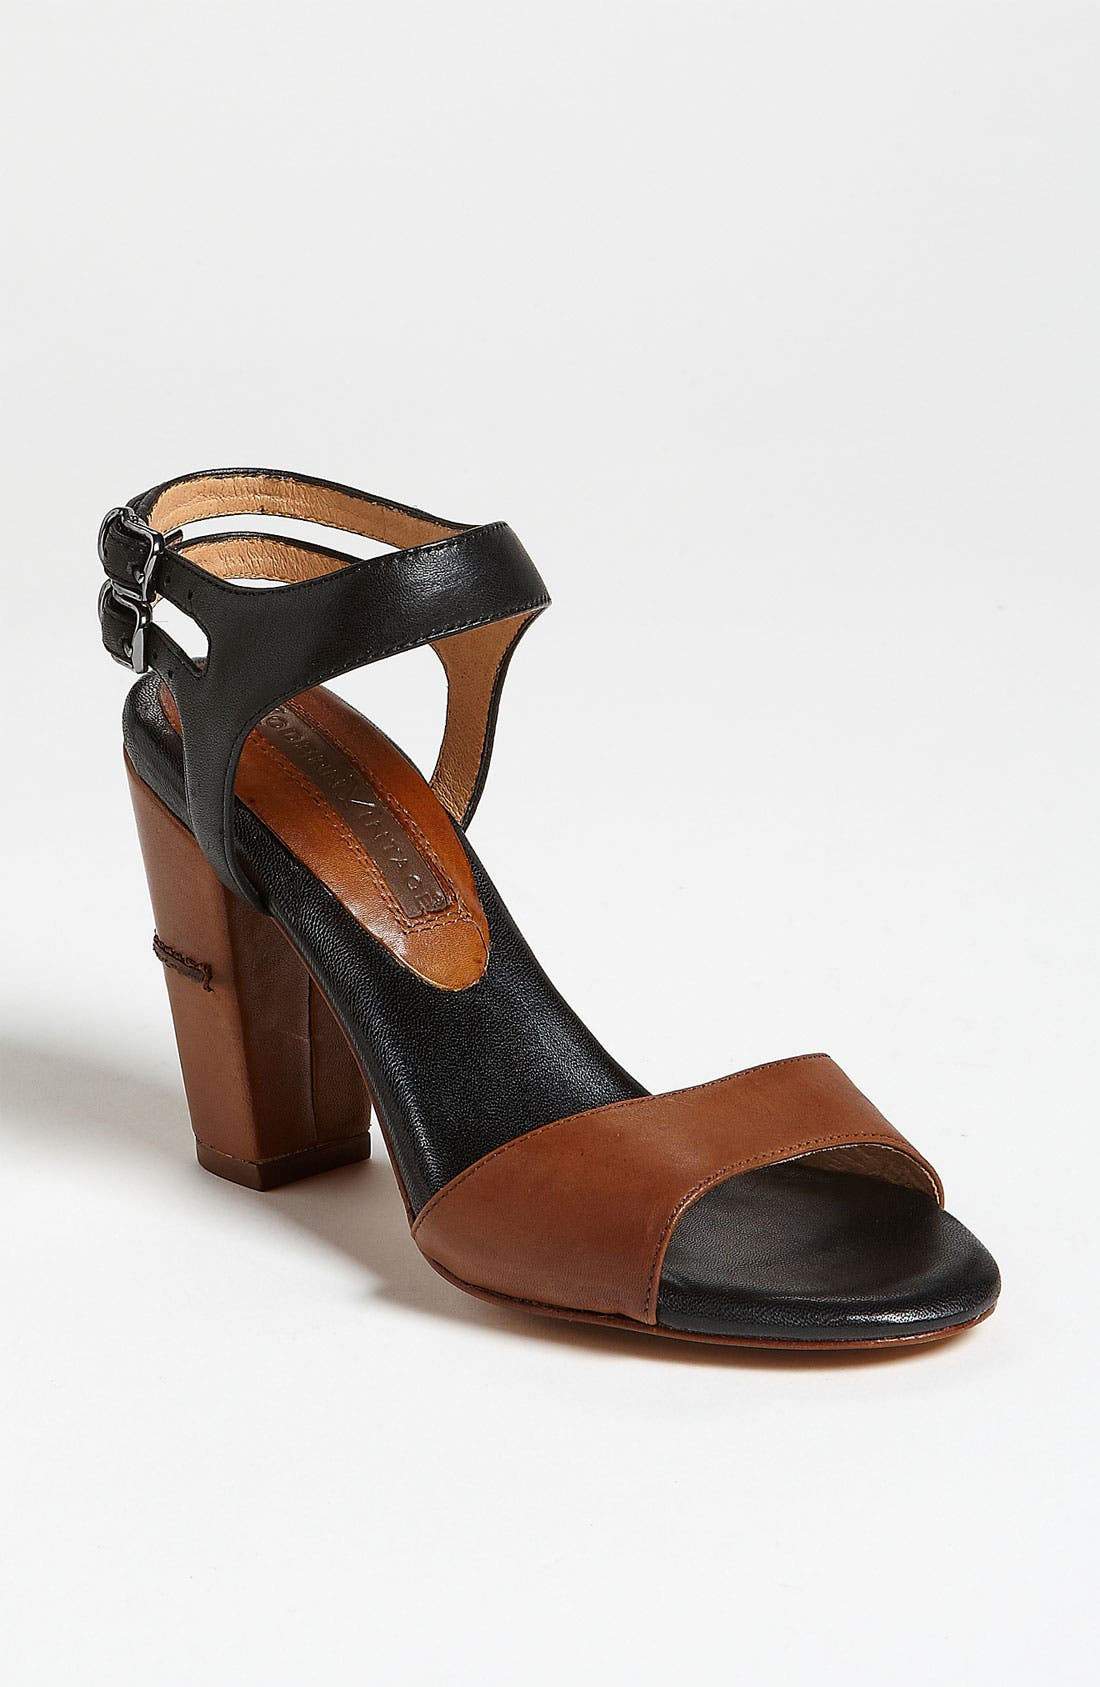 Alternate Image 1 Selected - Modern Vintage 'Roxy' Sandal